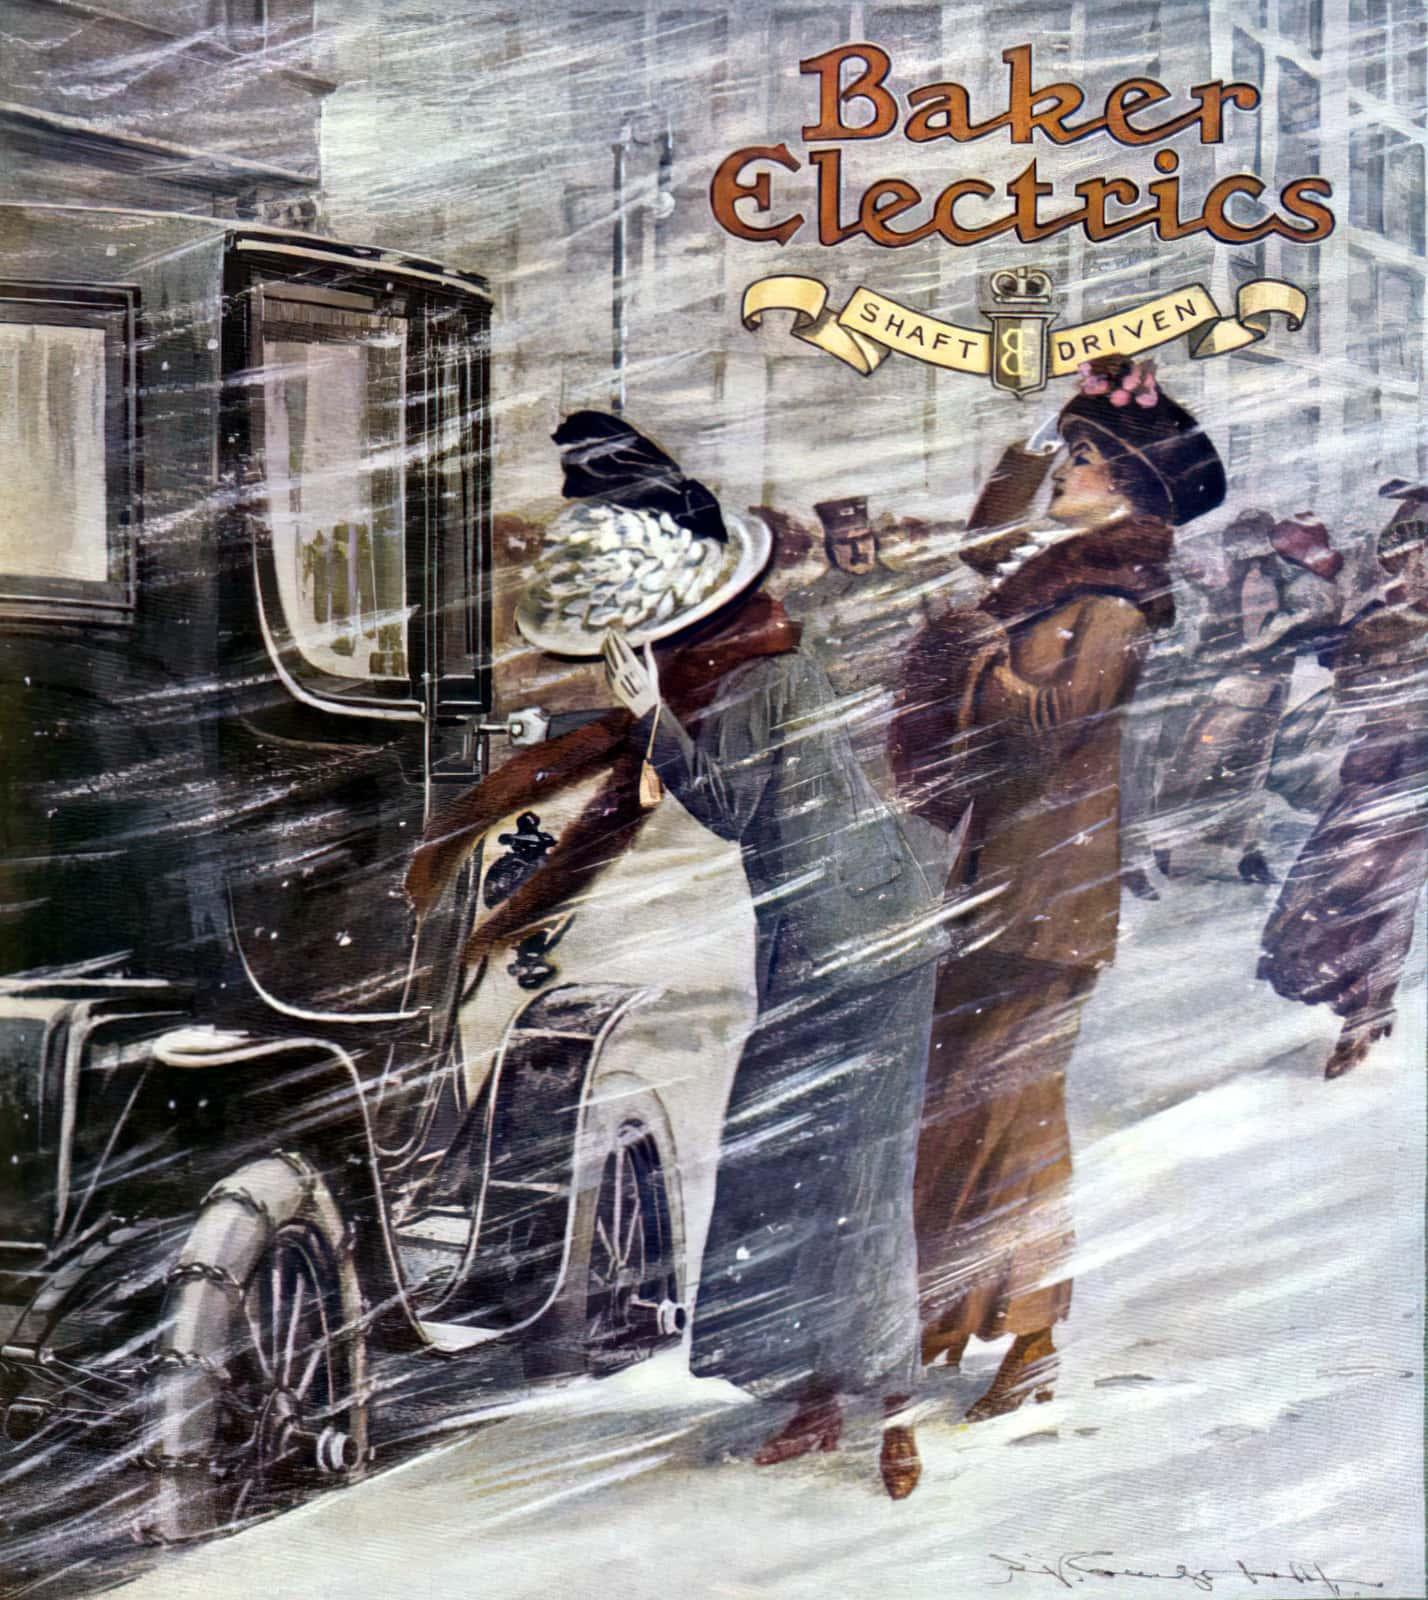 Baker Electrics motor vehicle 1911